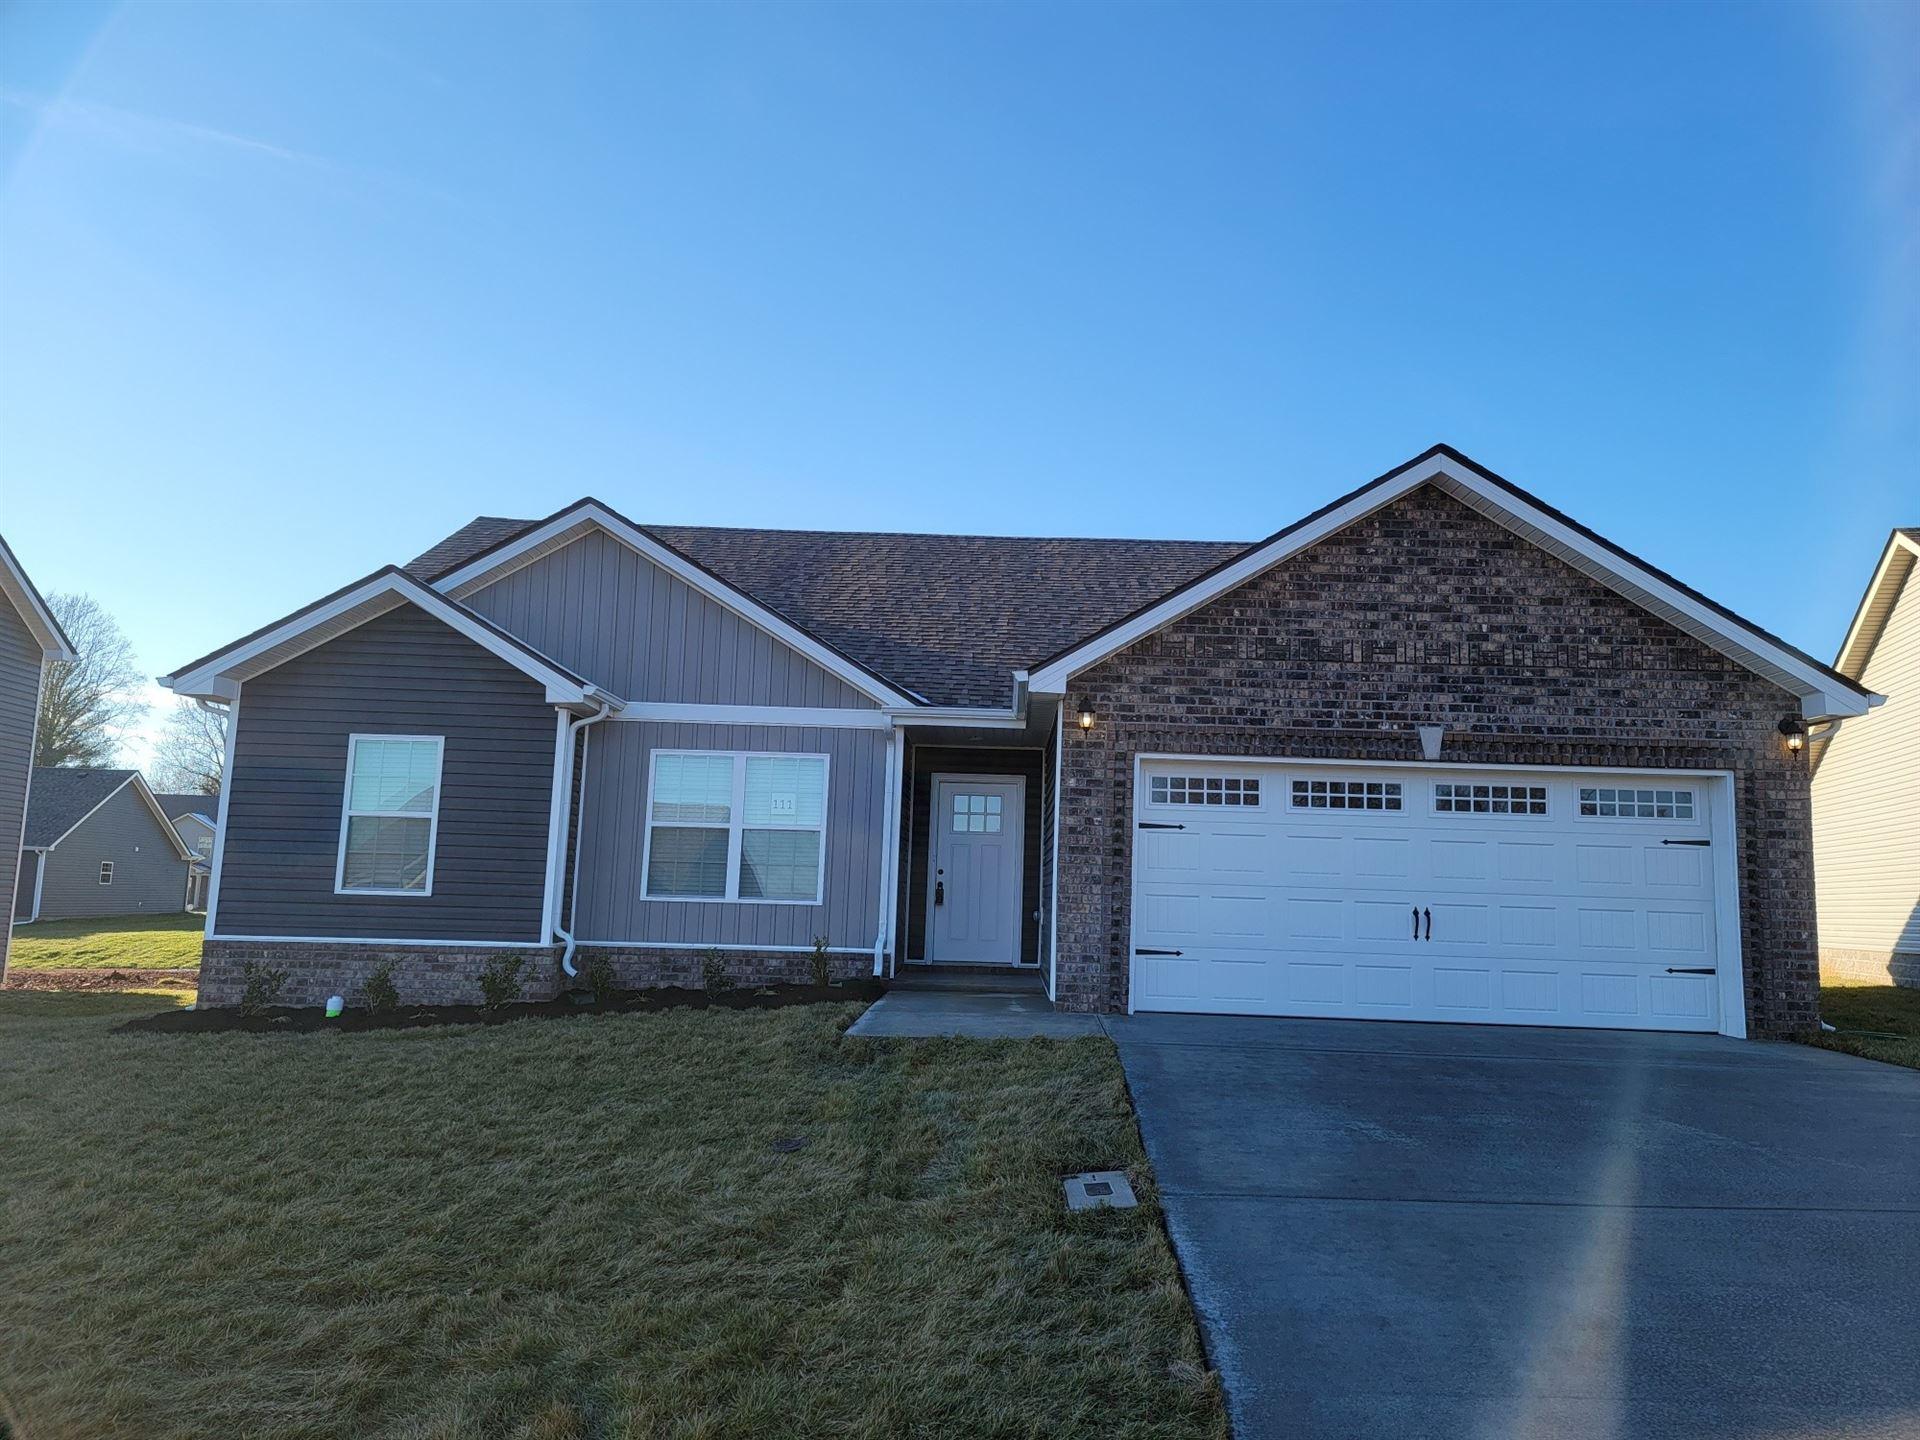 111 Irish Hills, Clarksville, TN 37042 - MLS#: 2291966